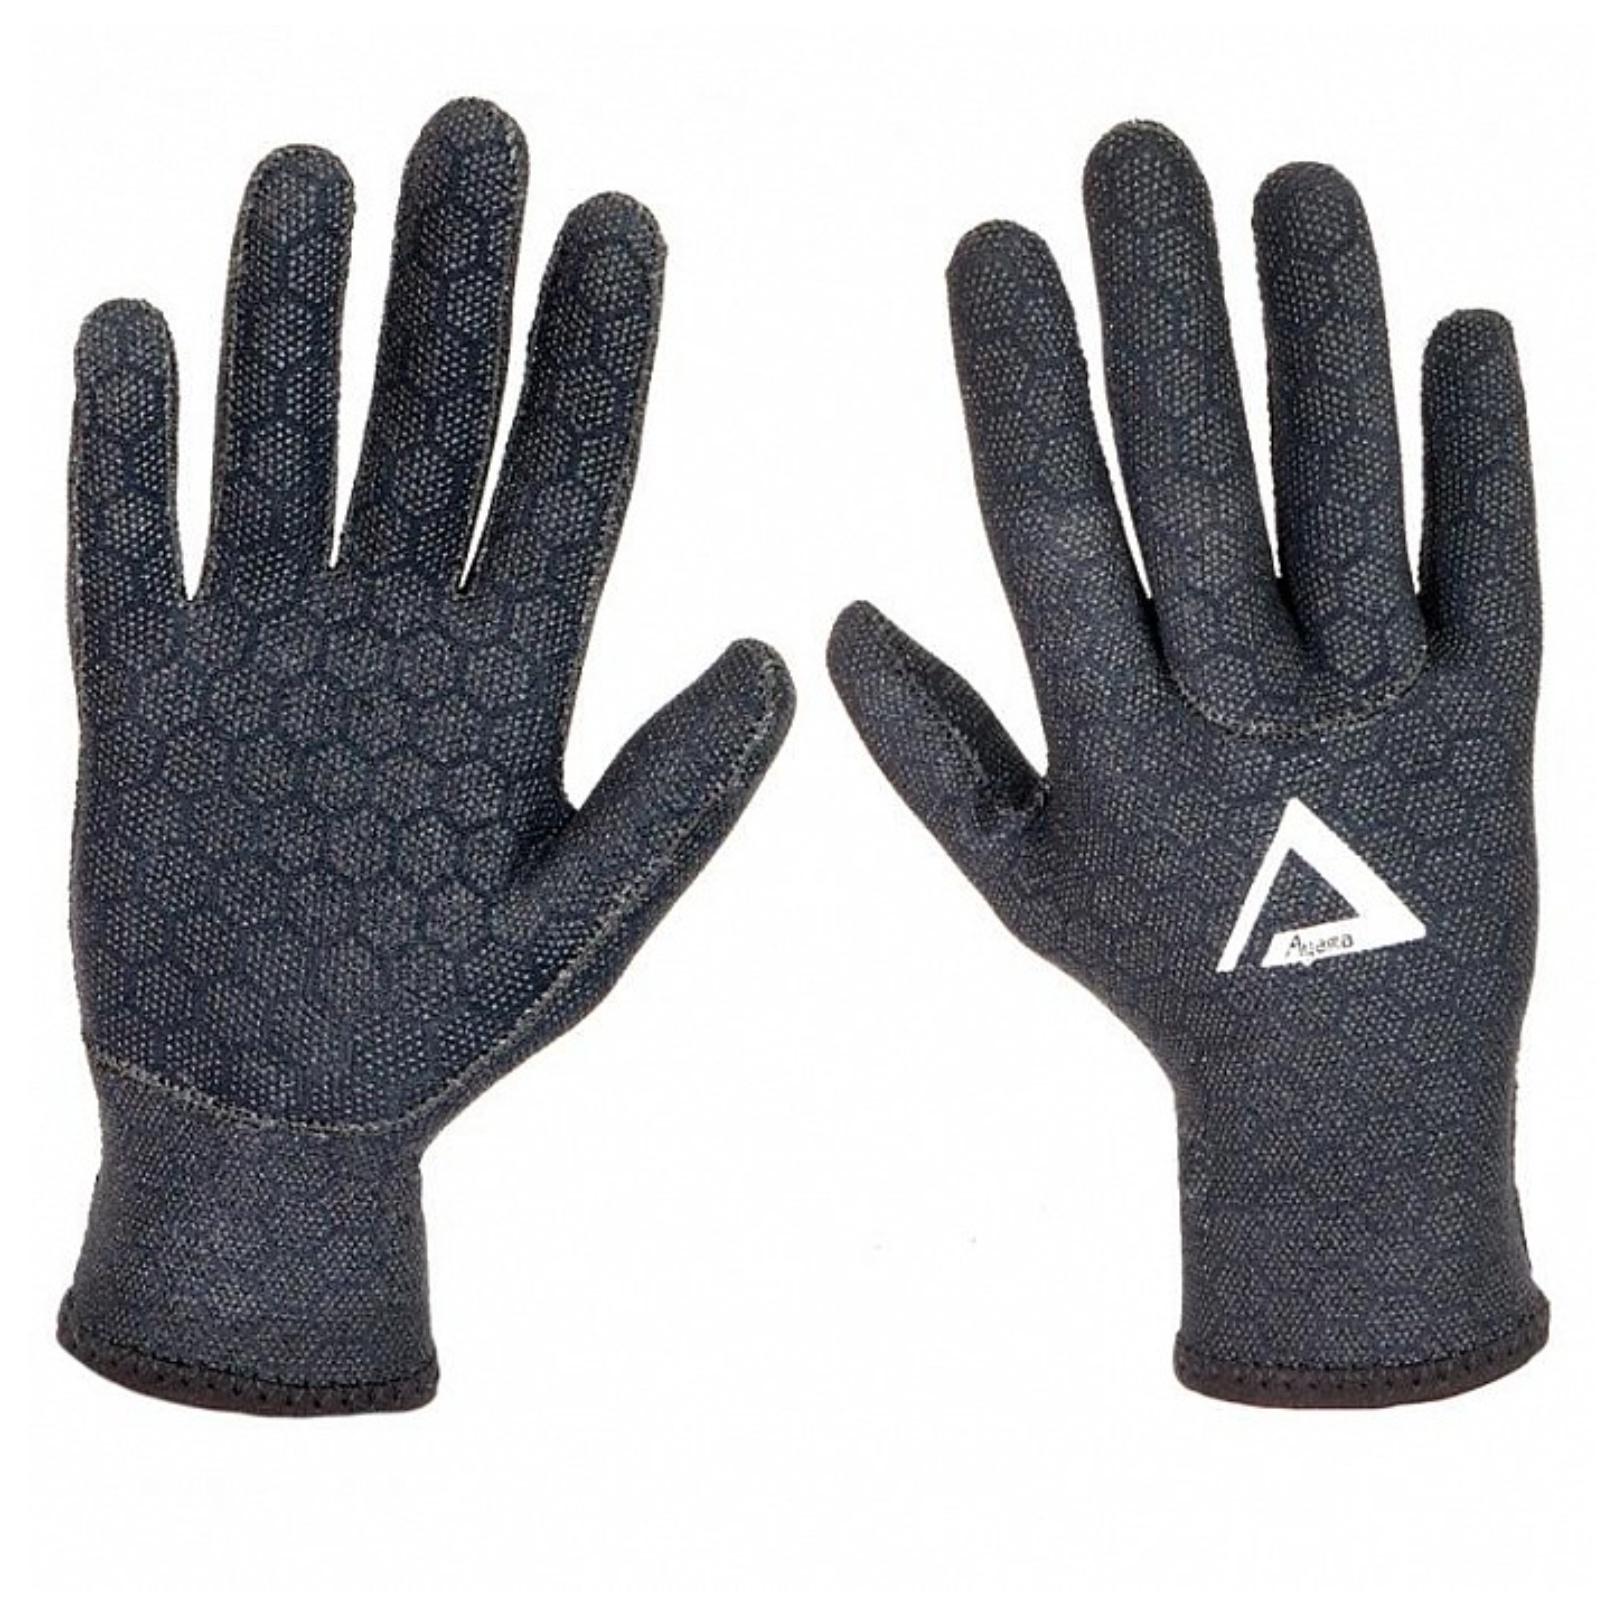 Neoprenové rukavice AGAMA Superstretch 3 mm - vel. M